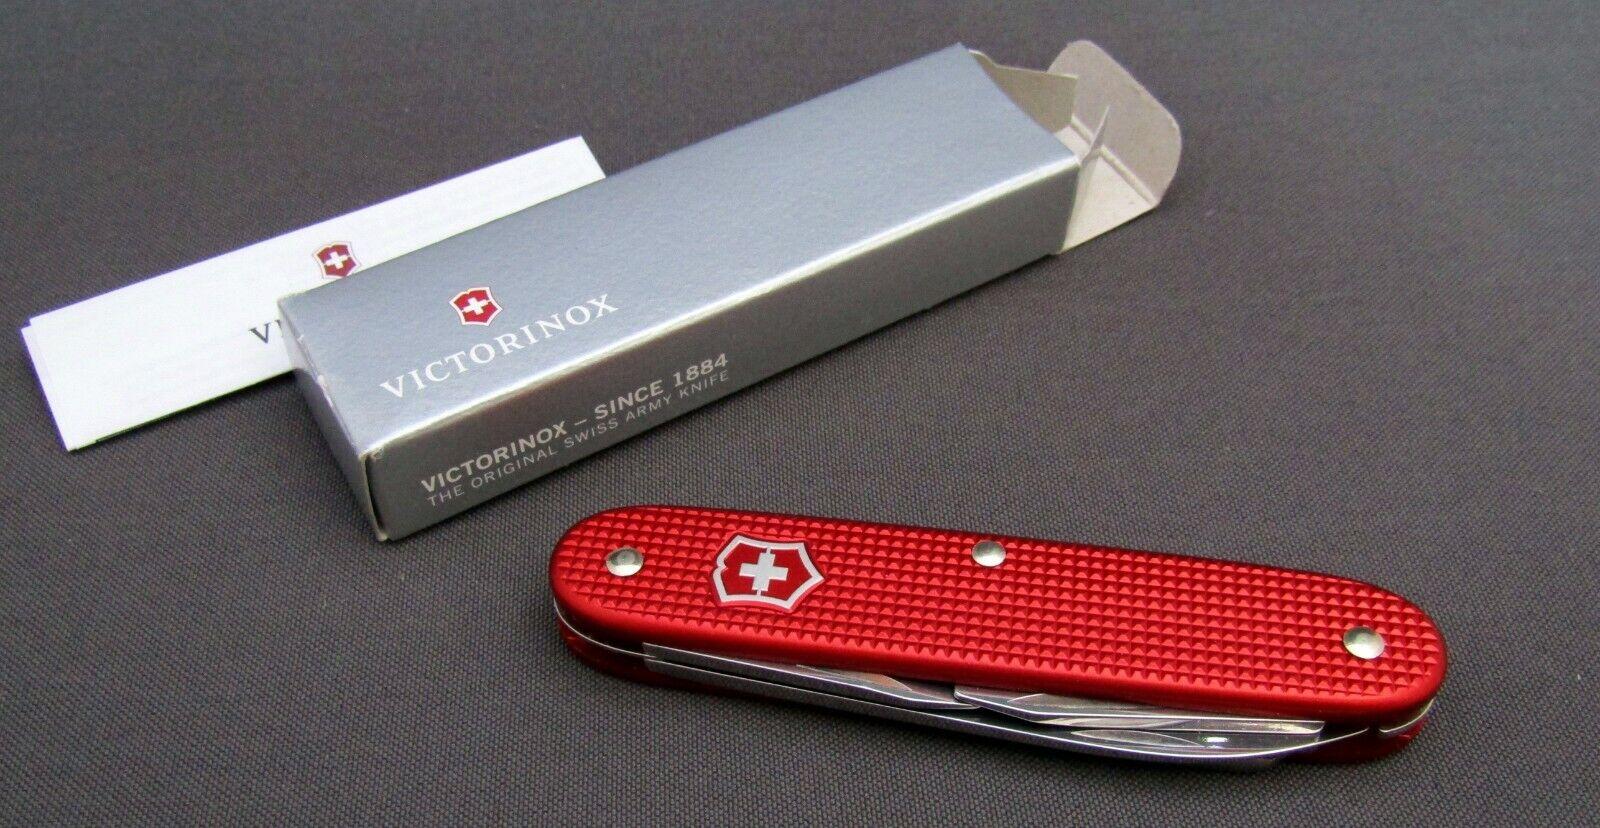 Coltellino svizzero, VICTORINOX PIONEER Antonov, Alox, Swiss Army Knife